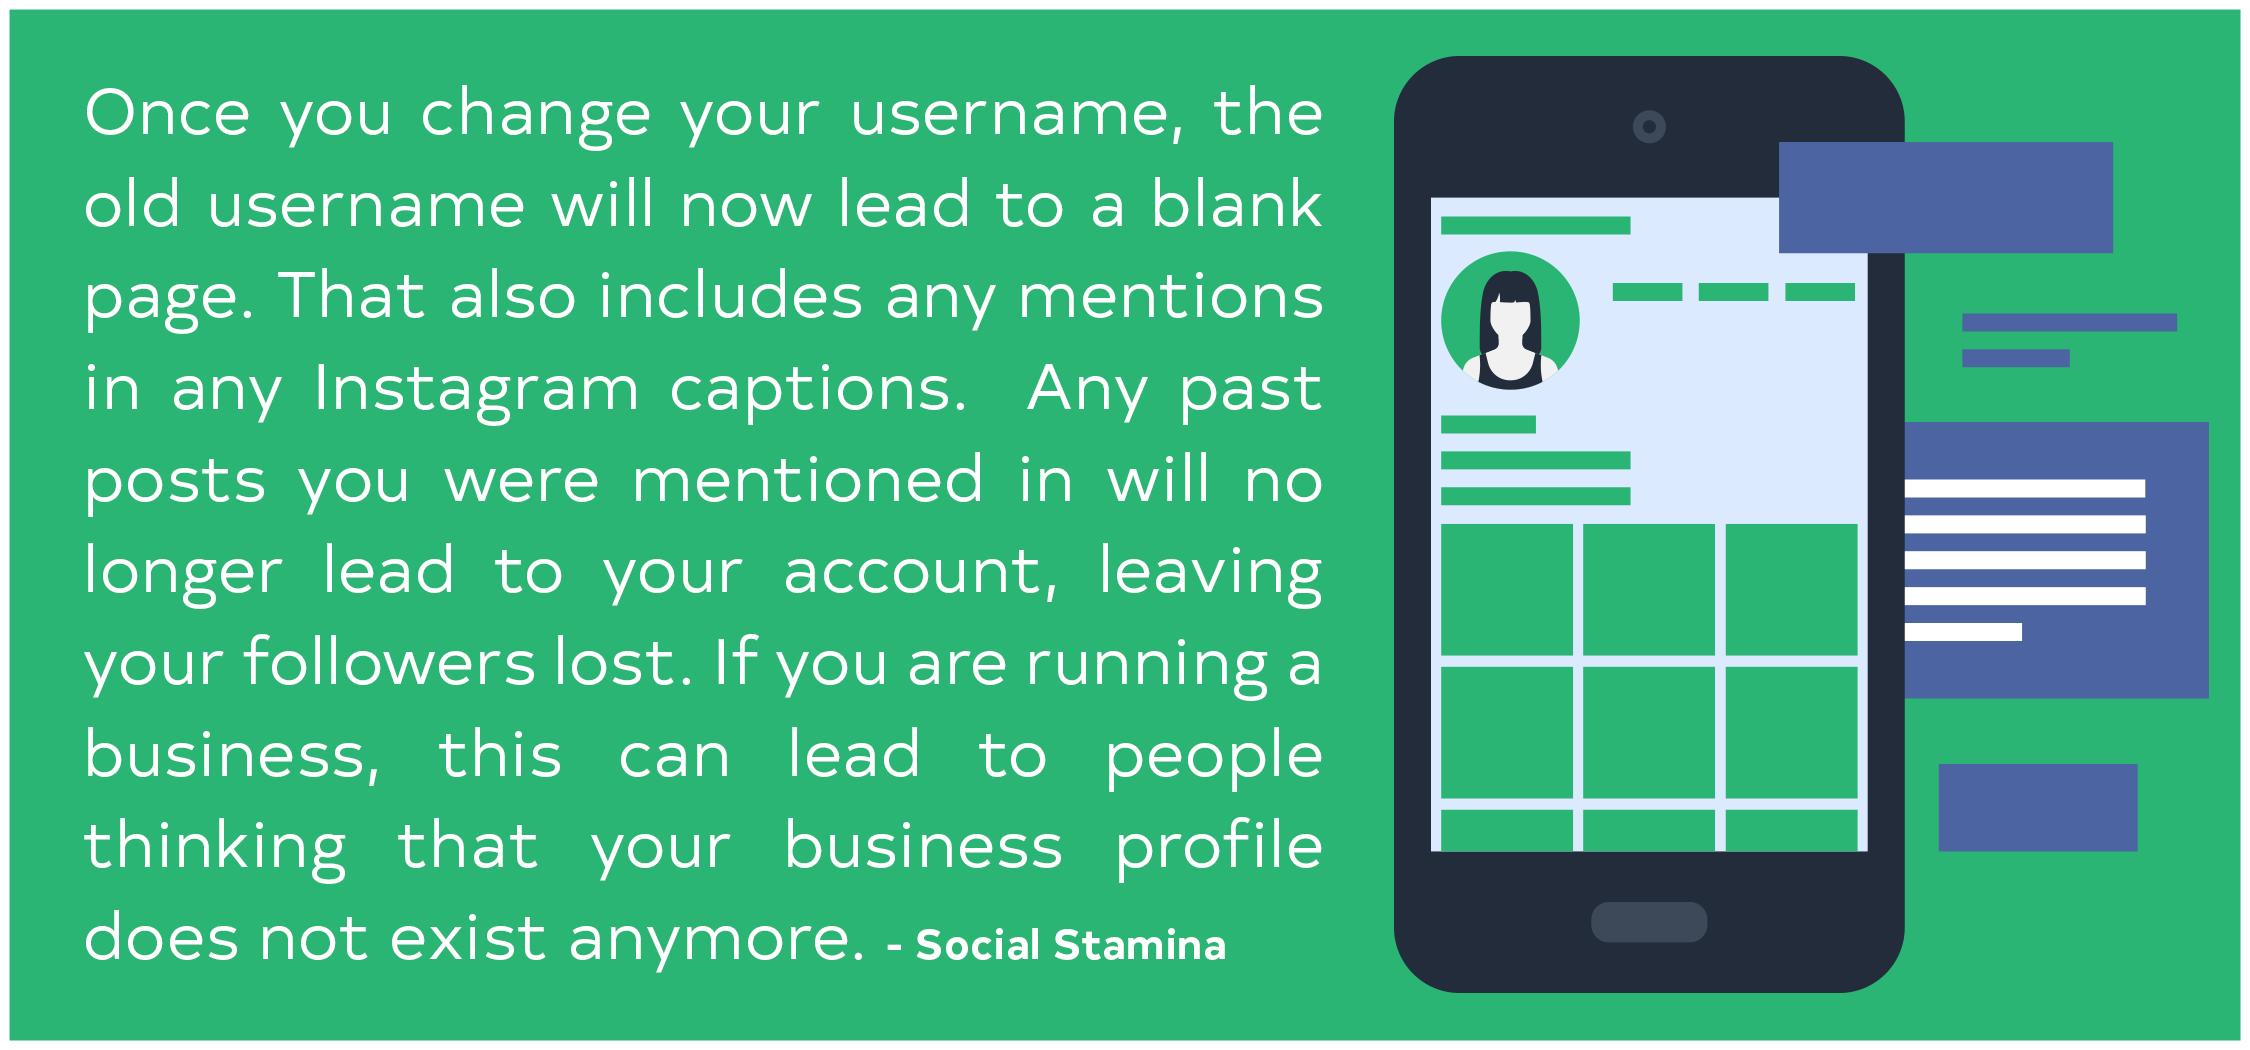 Social-Stamina-Change-Instagram-Handle